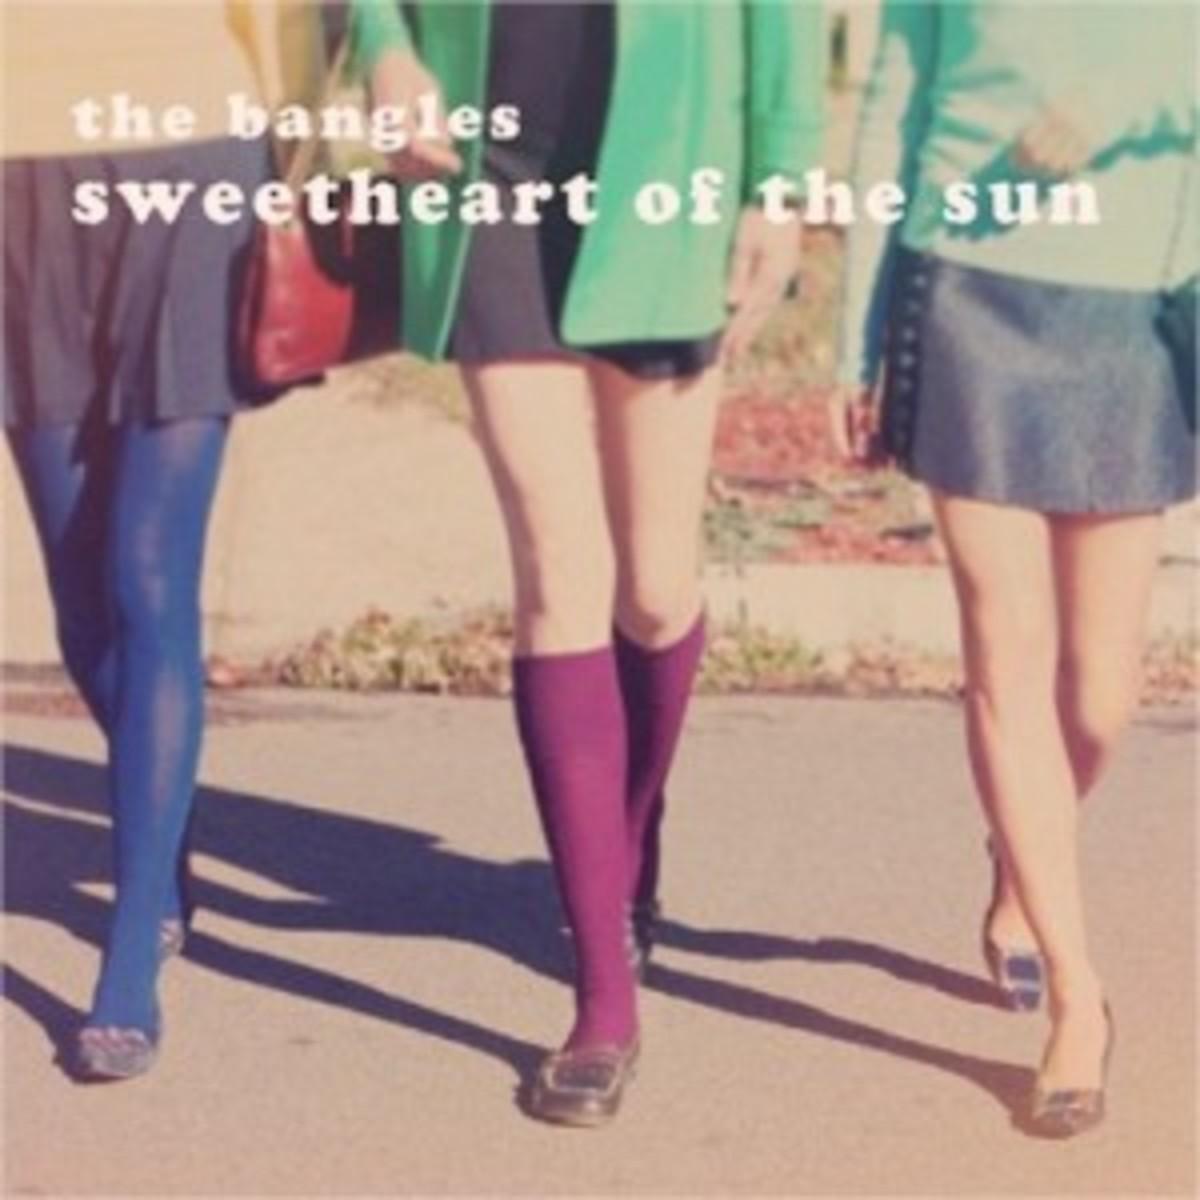 Bangles_Sweetheart of the Sun sleeve